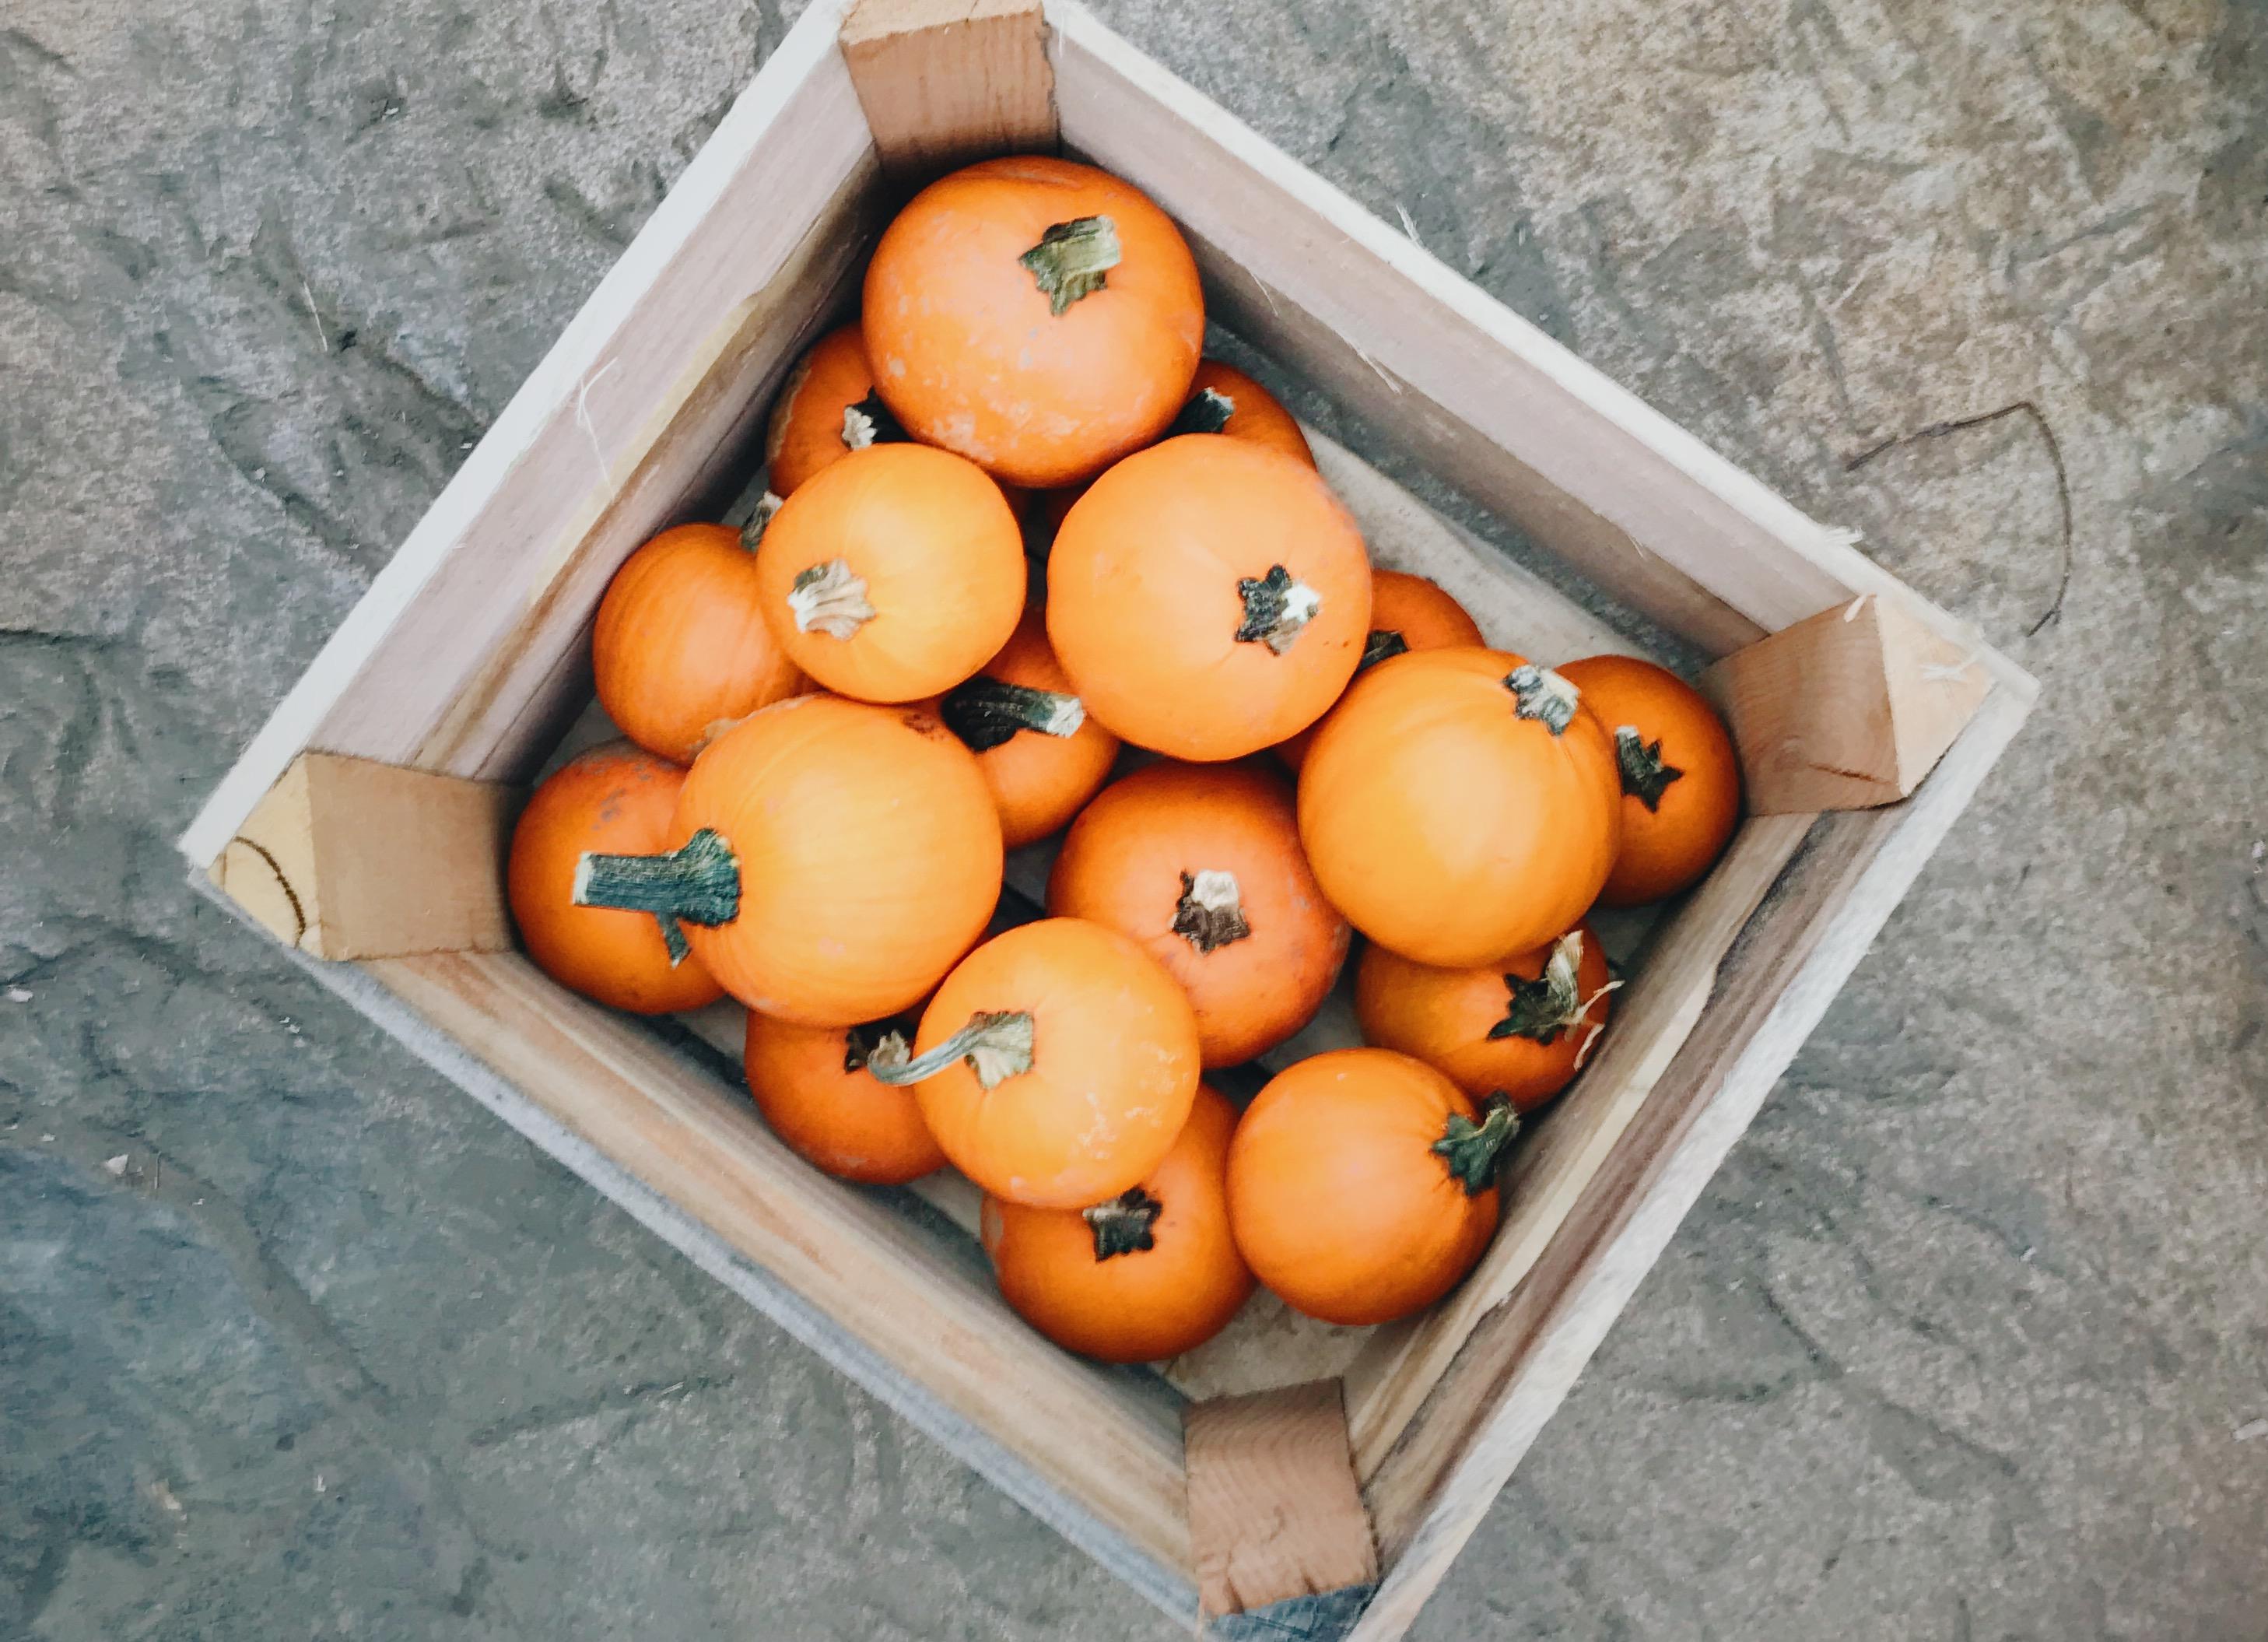 pumpkin patch king of prussia pa